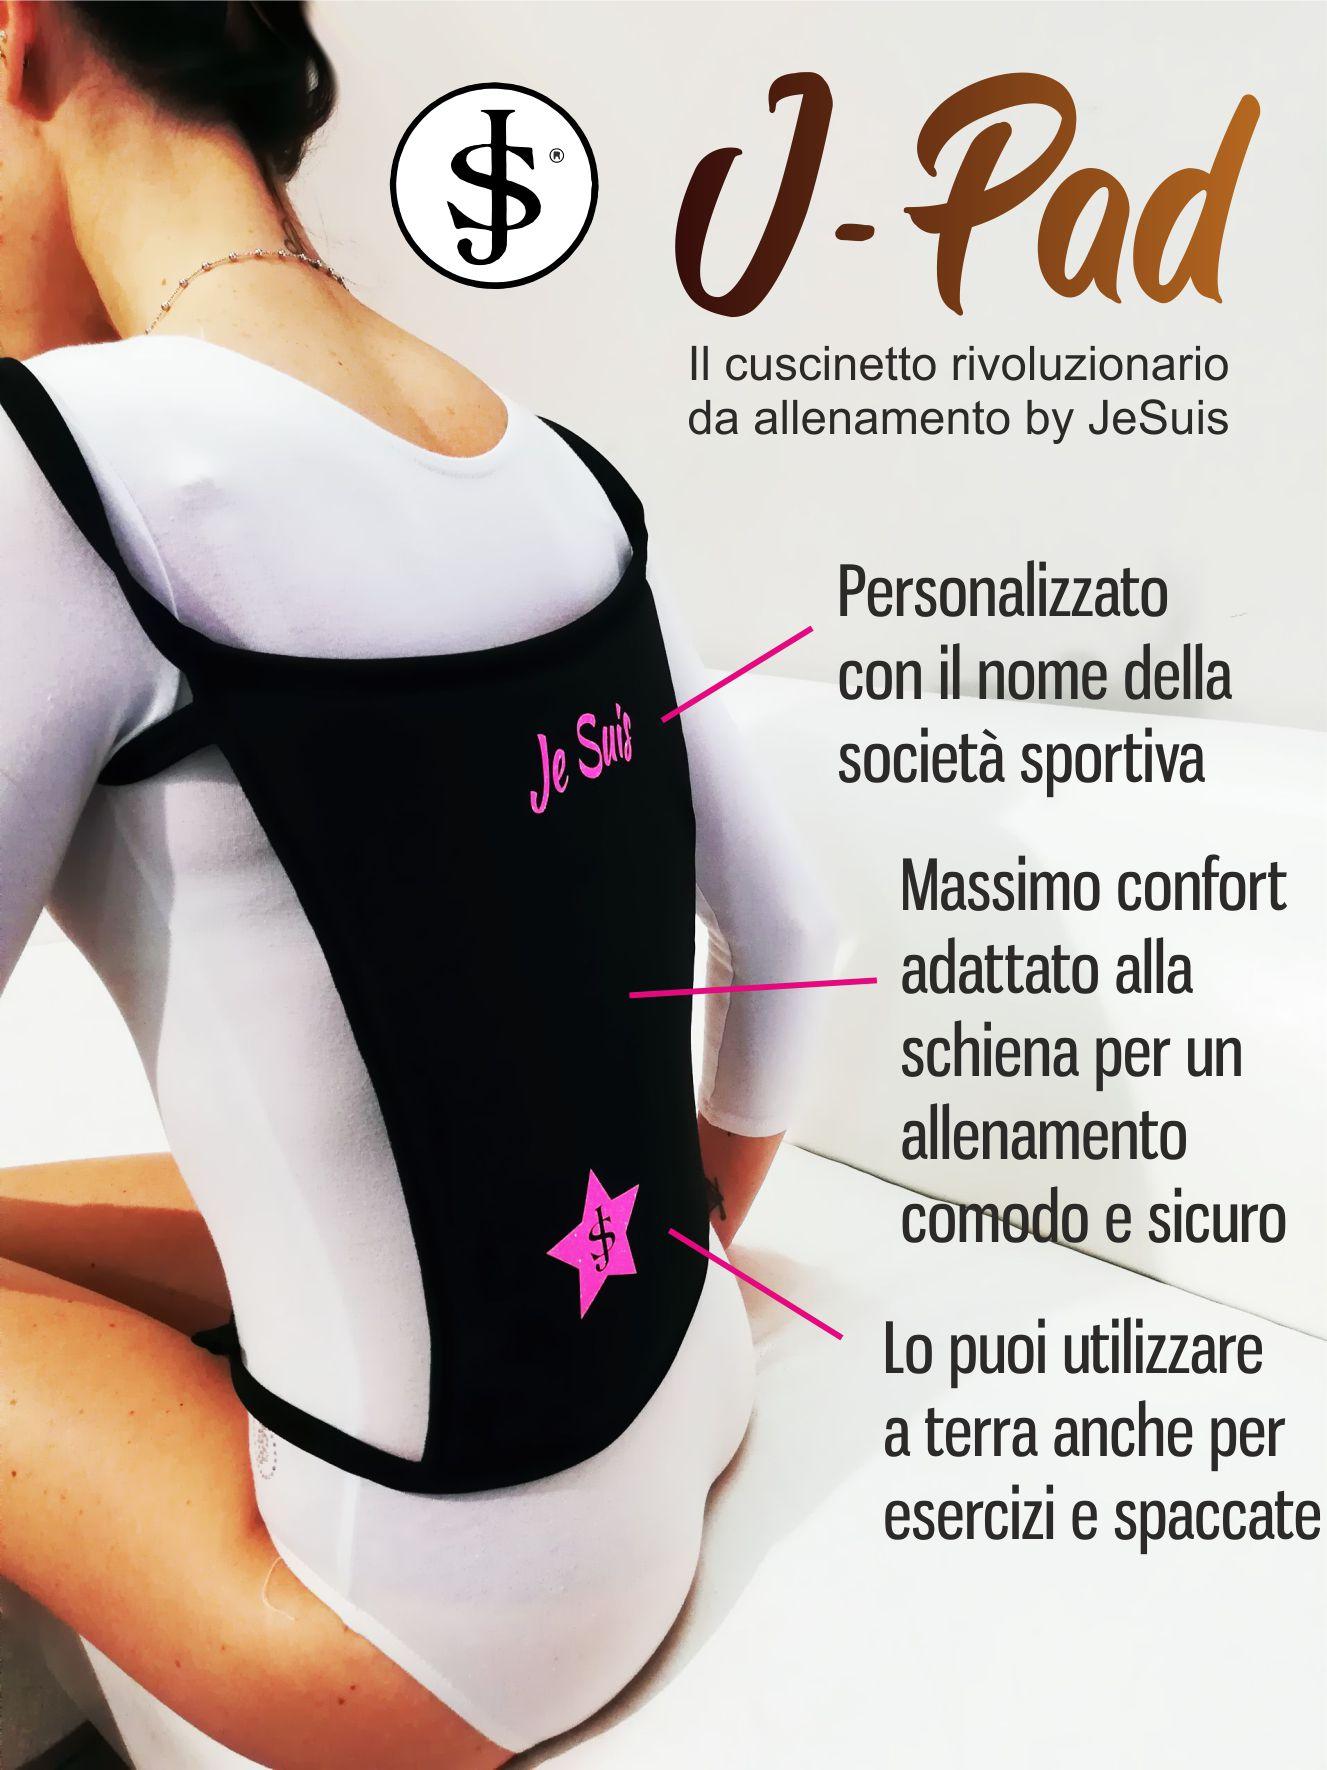 J-pad cuscinetto € 15,00